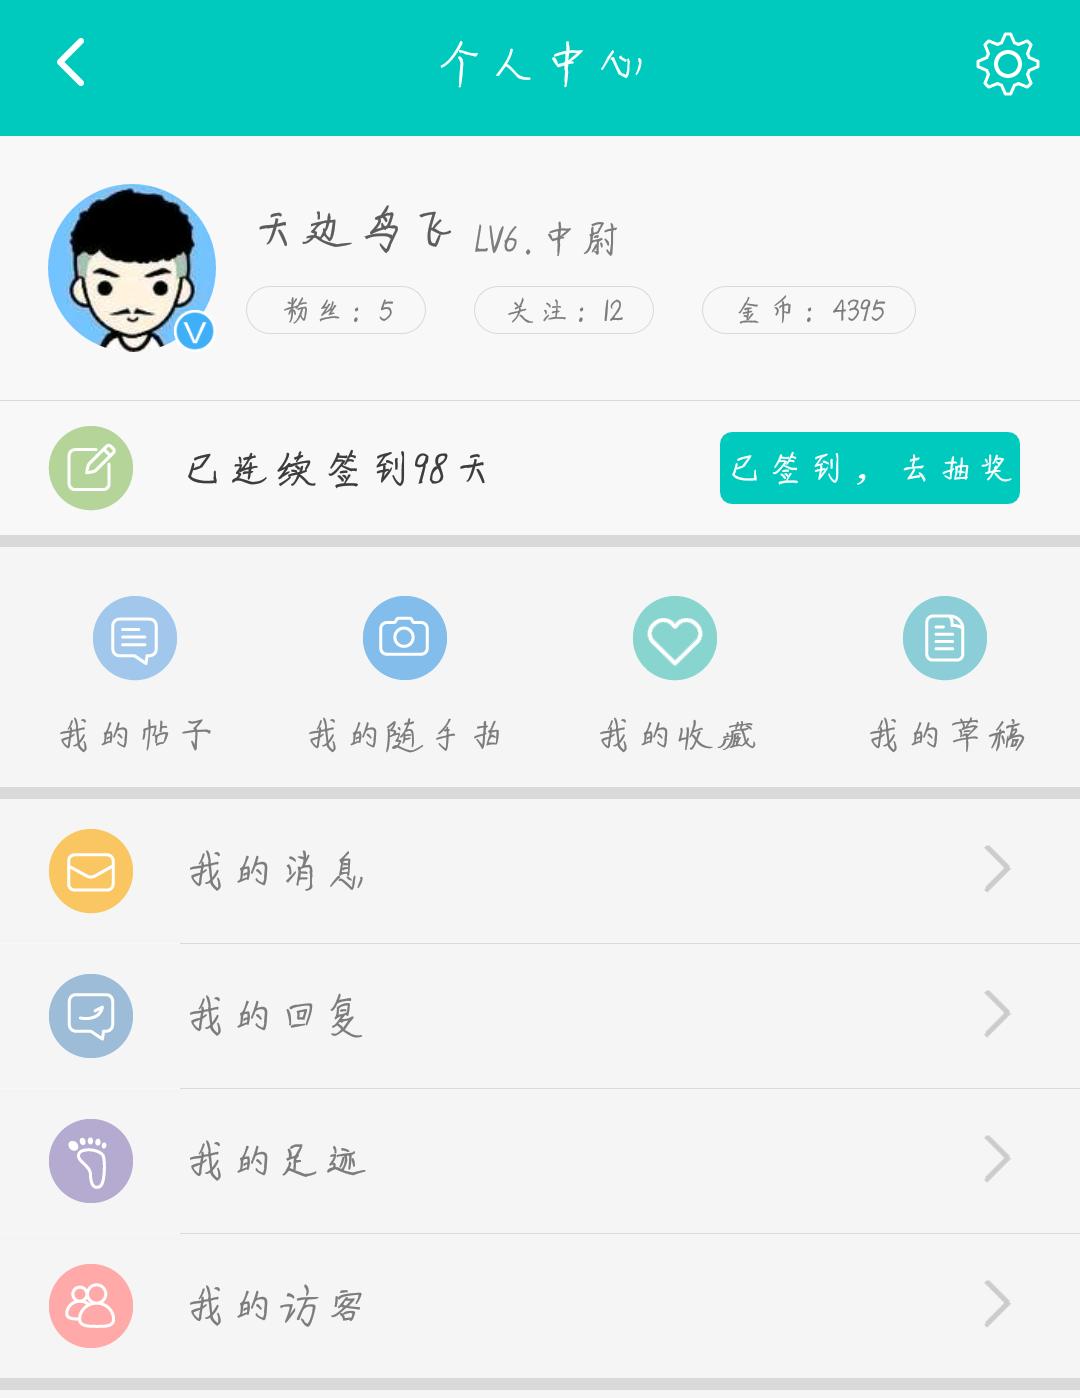 Screenshot_2018-09-04-12-41-14.png